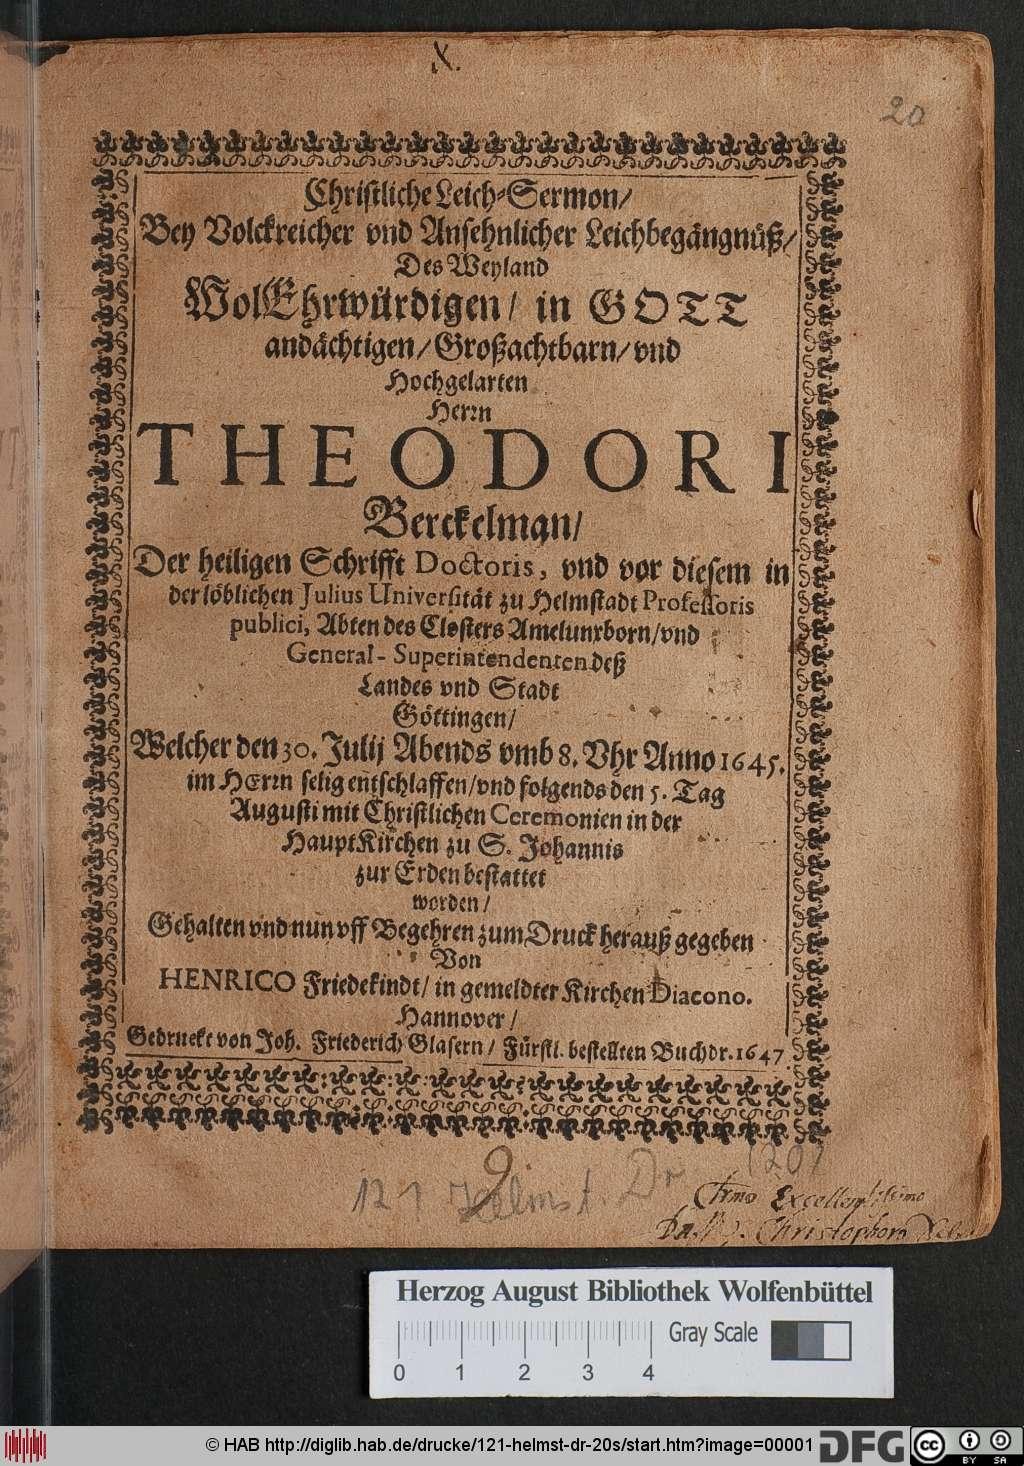 http://diglib.hab.de/drucke/121-helmst-dr-20s/00001.jpg